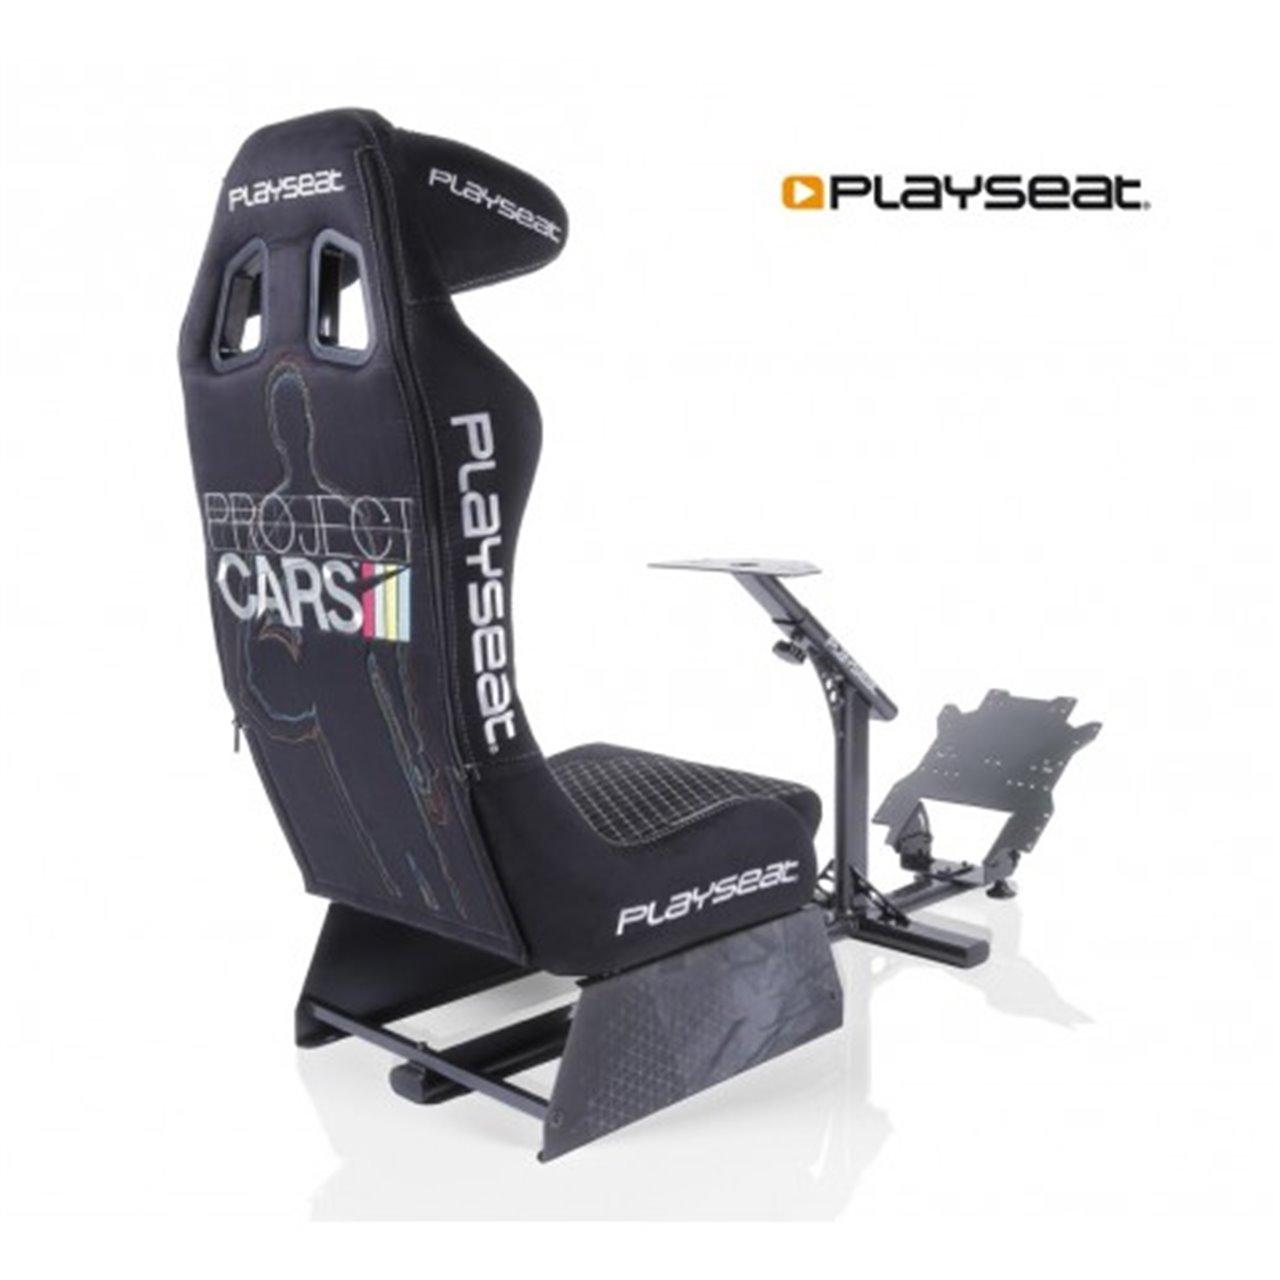 PLAYSEAT PROJECT CARS racing seat